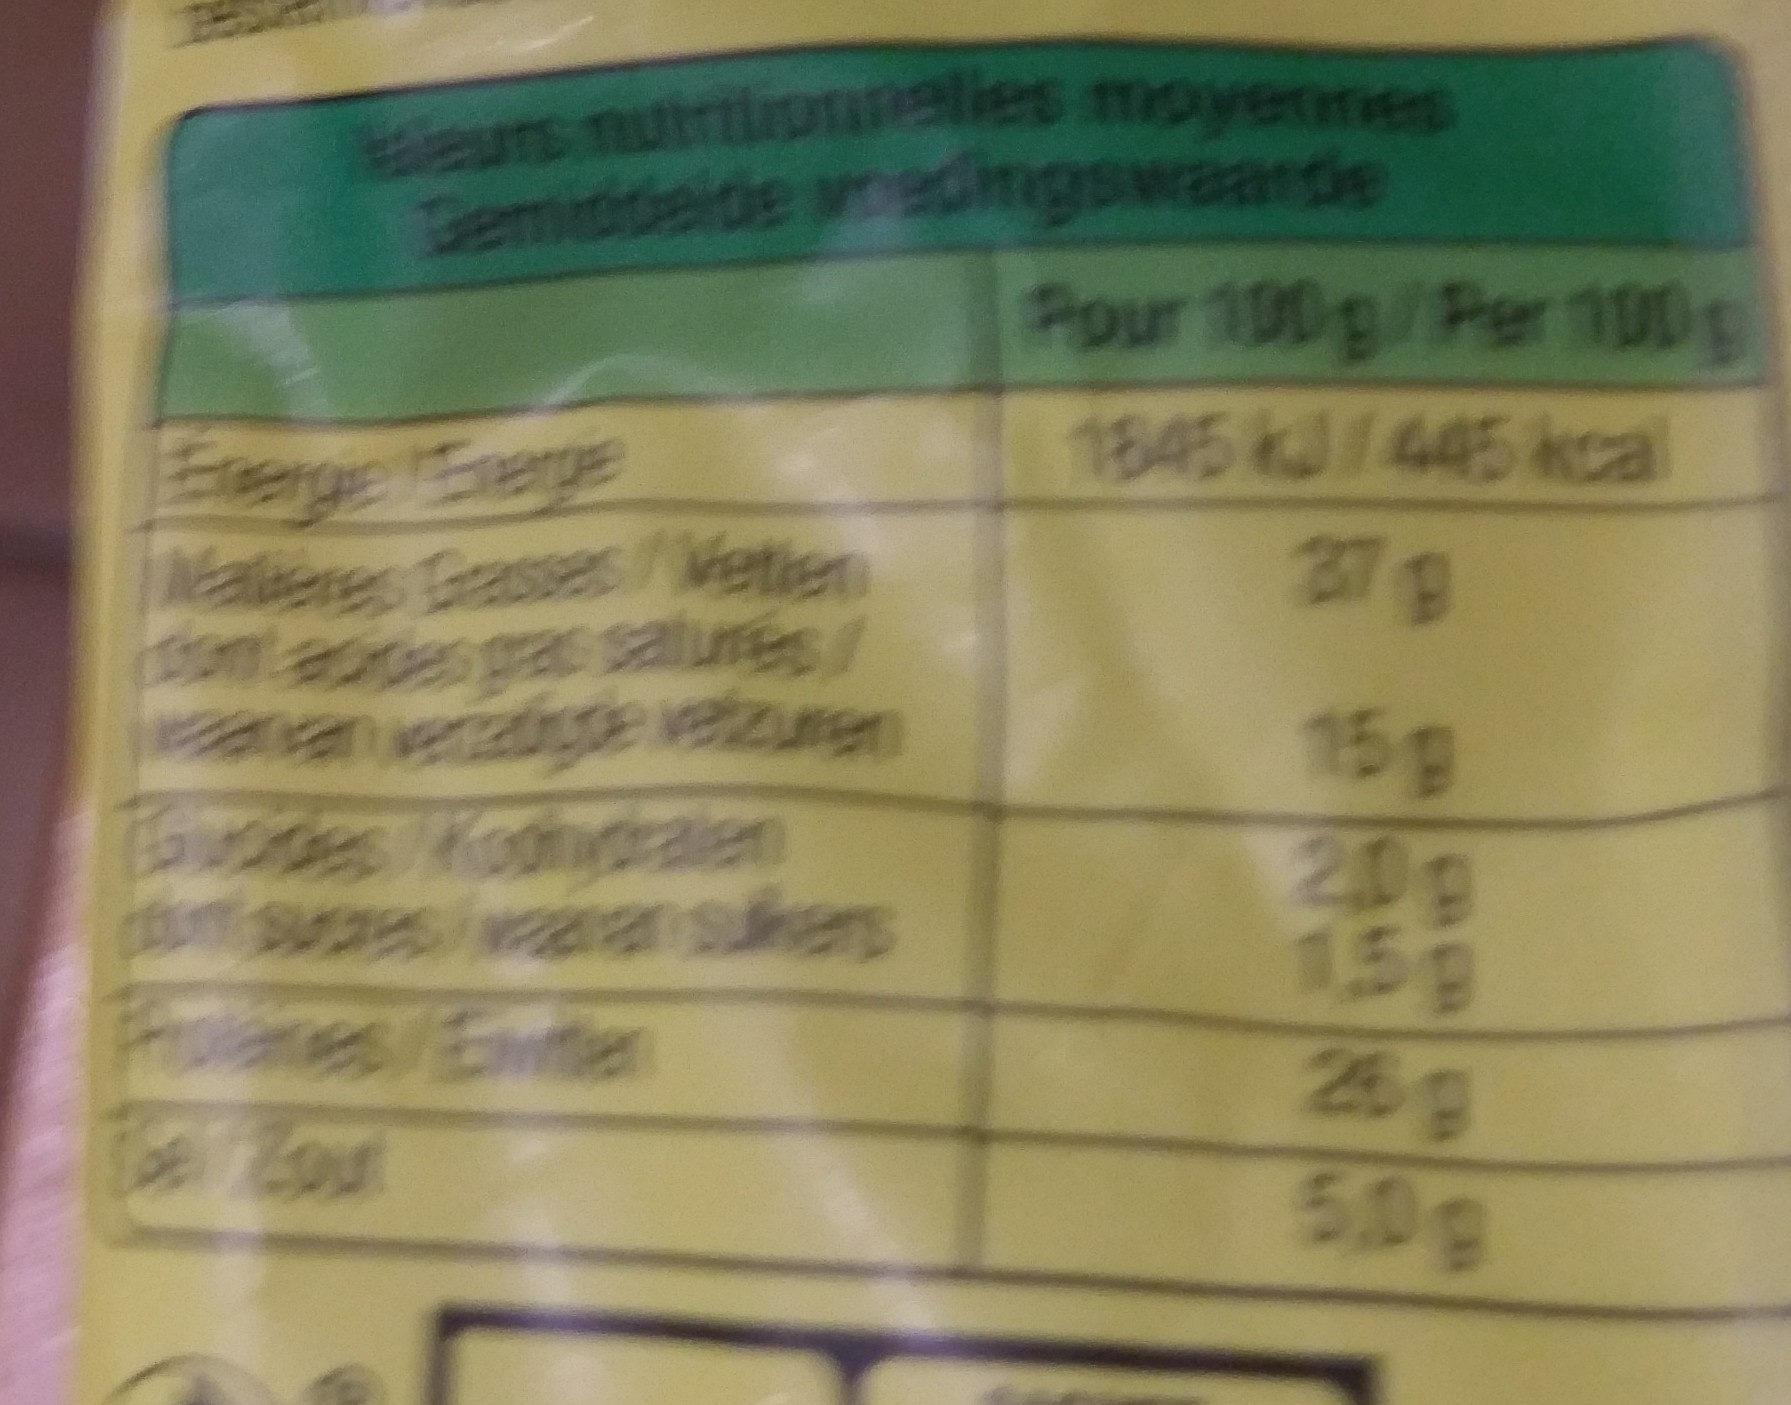 JUSTE SECHE - Informations nutritionnelles - fr